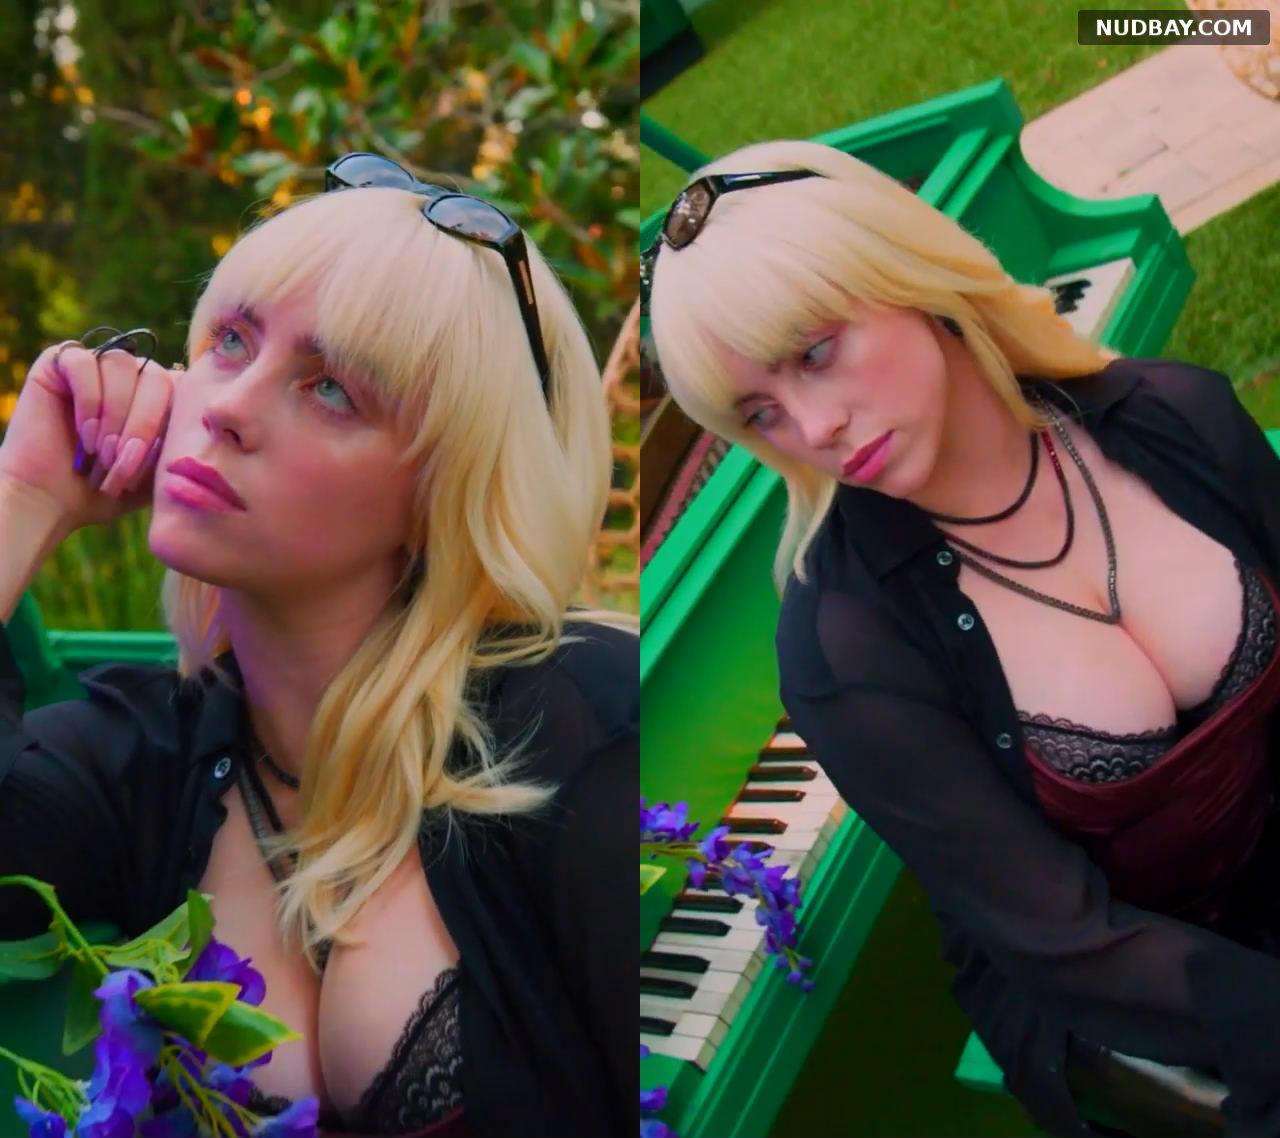 Billie Eilish nude most perfect night Jul 30 2021